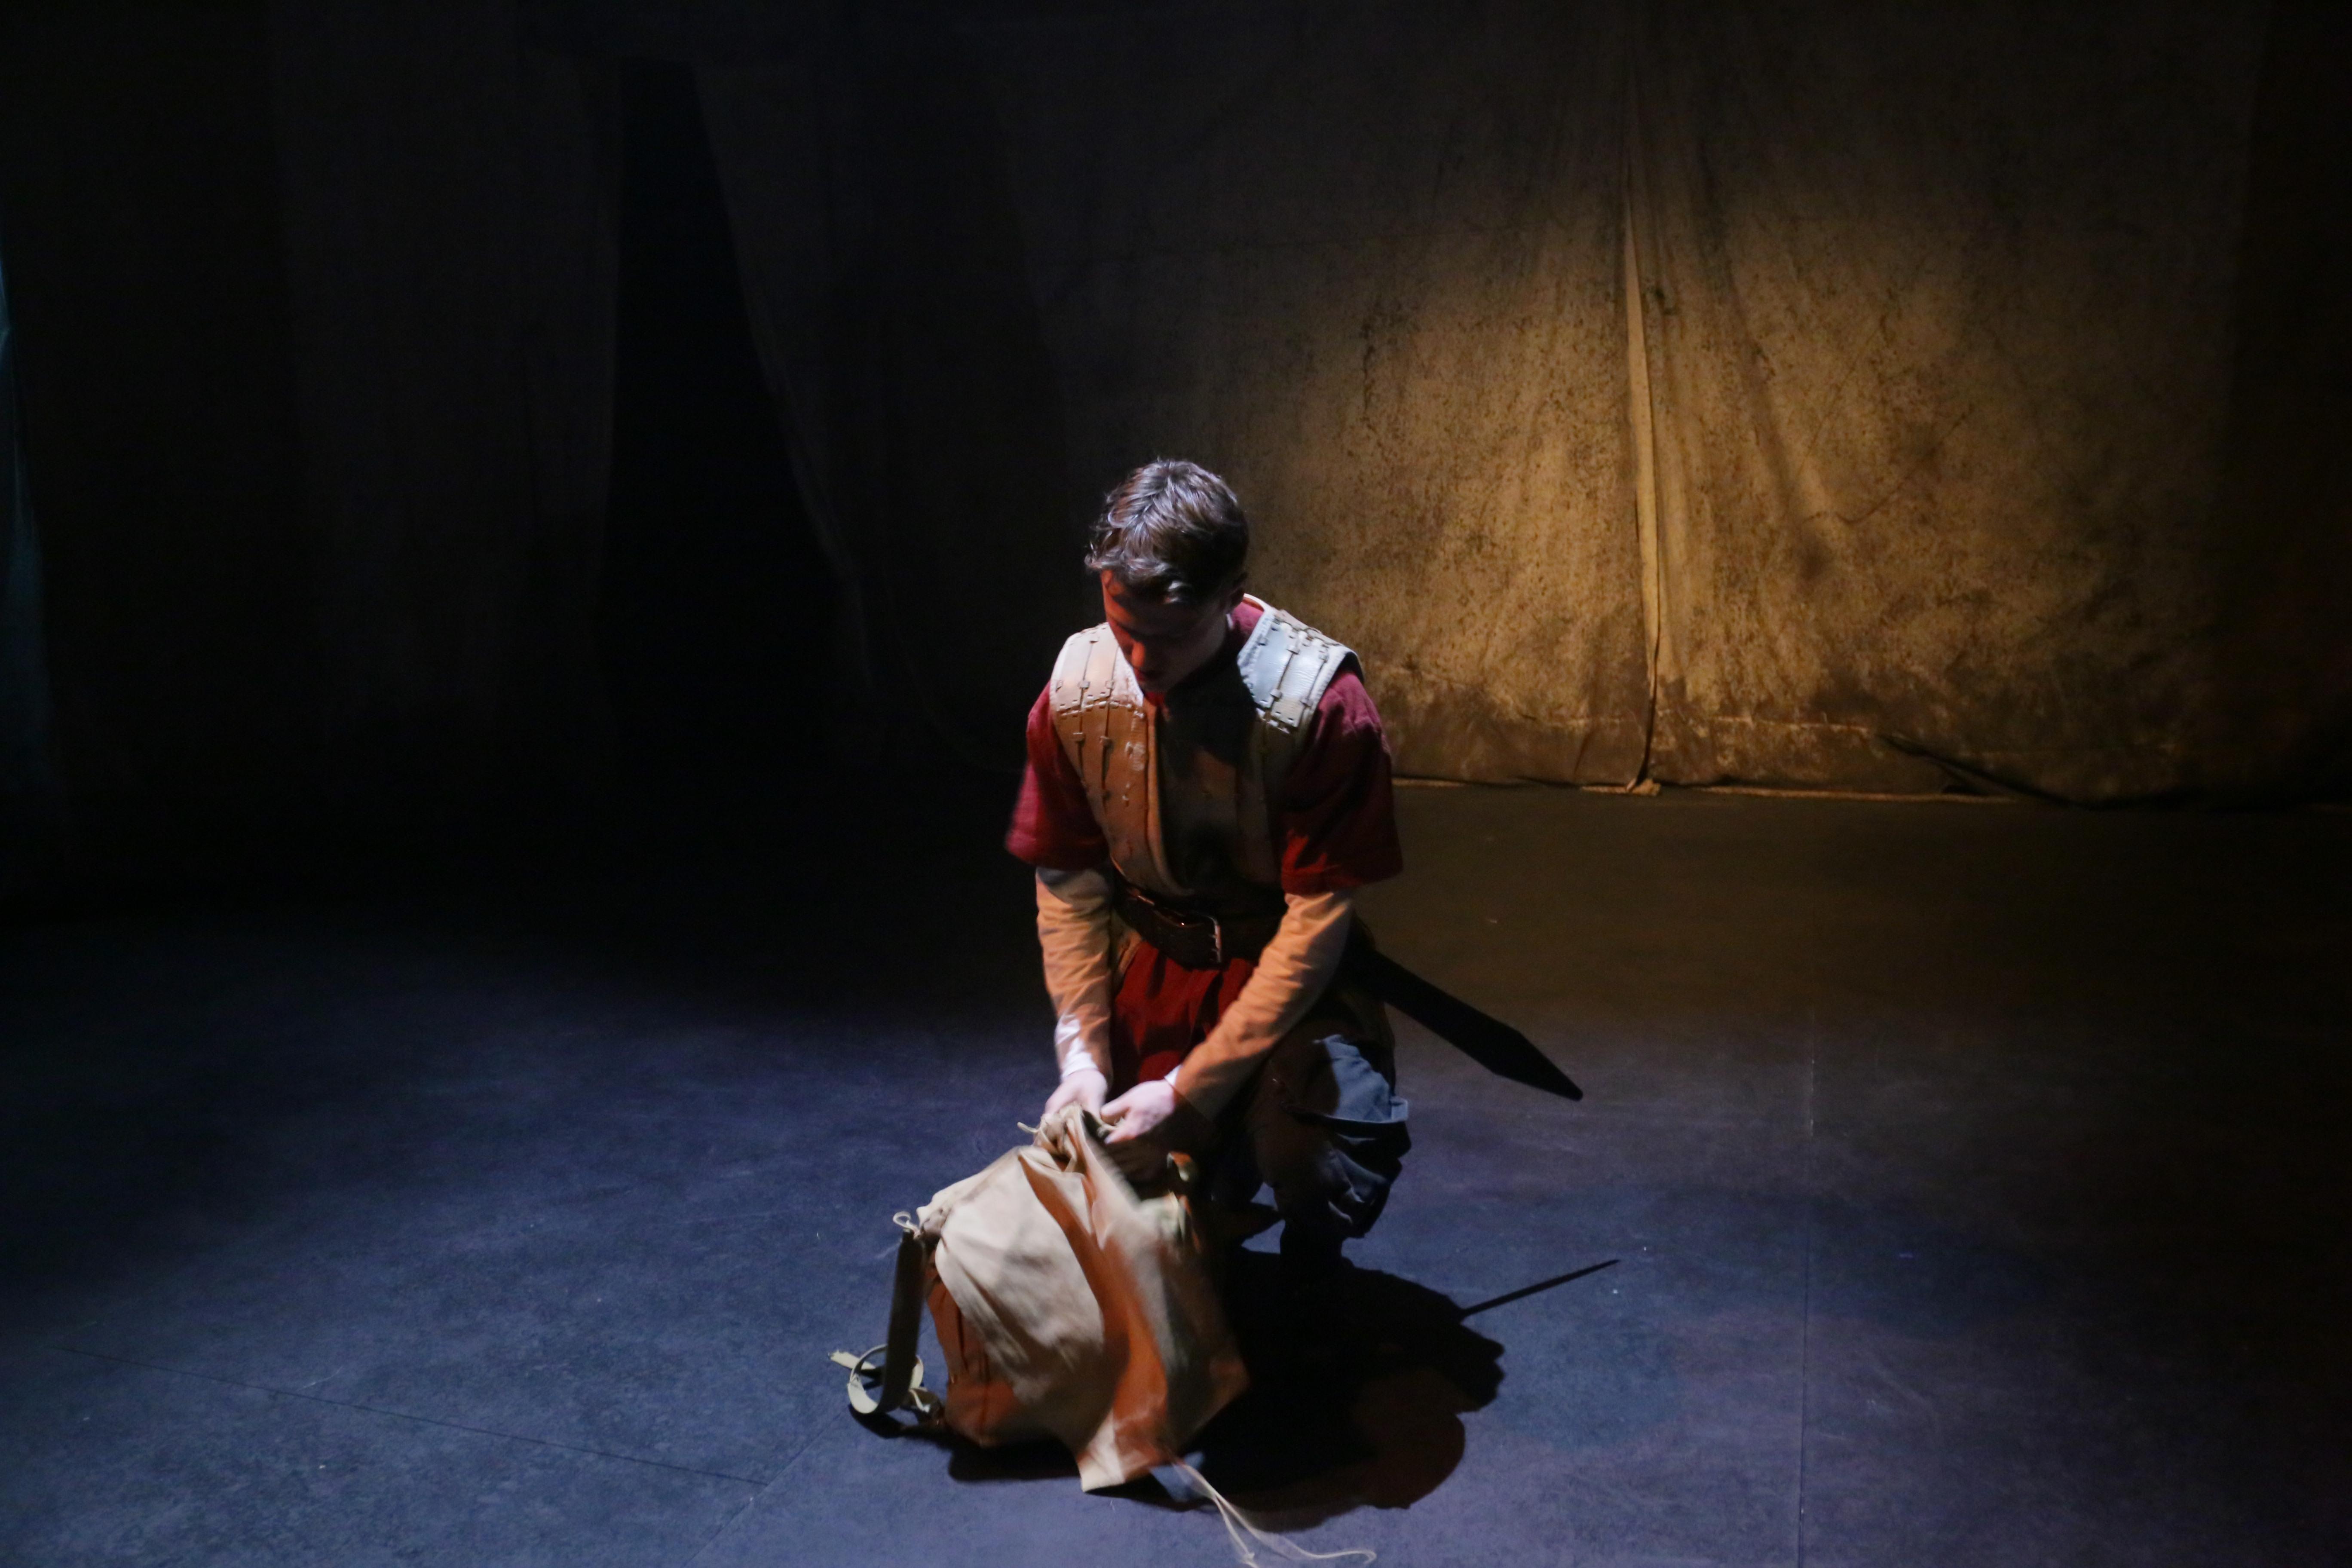 Suetonius (Jonty Peach)